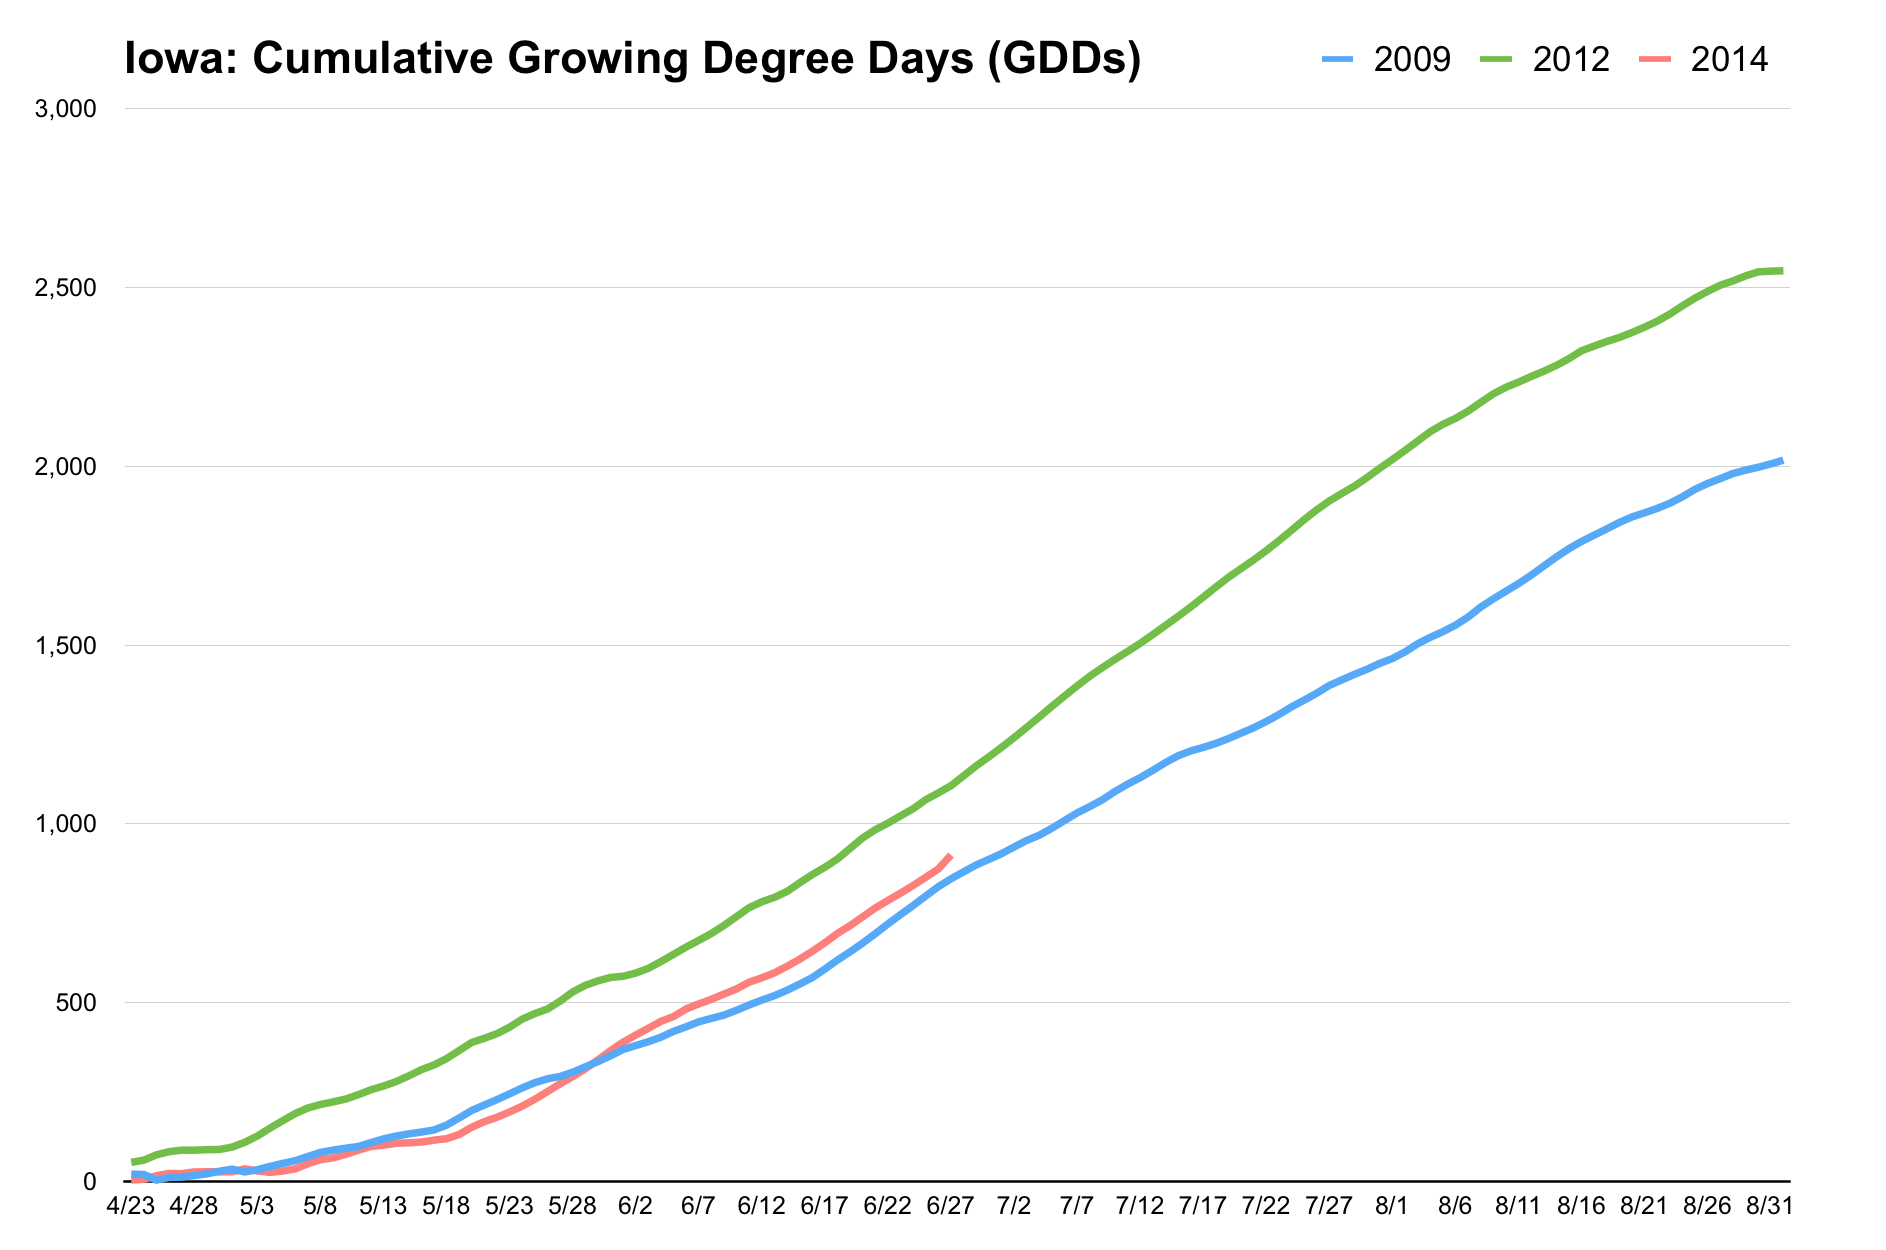 Iowa: Cumulative Growing Degree Days